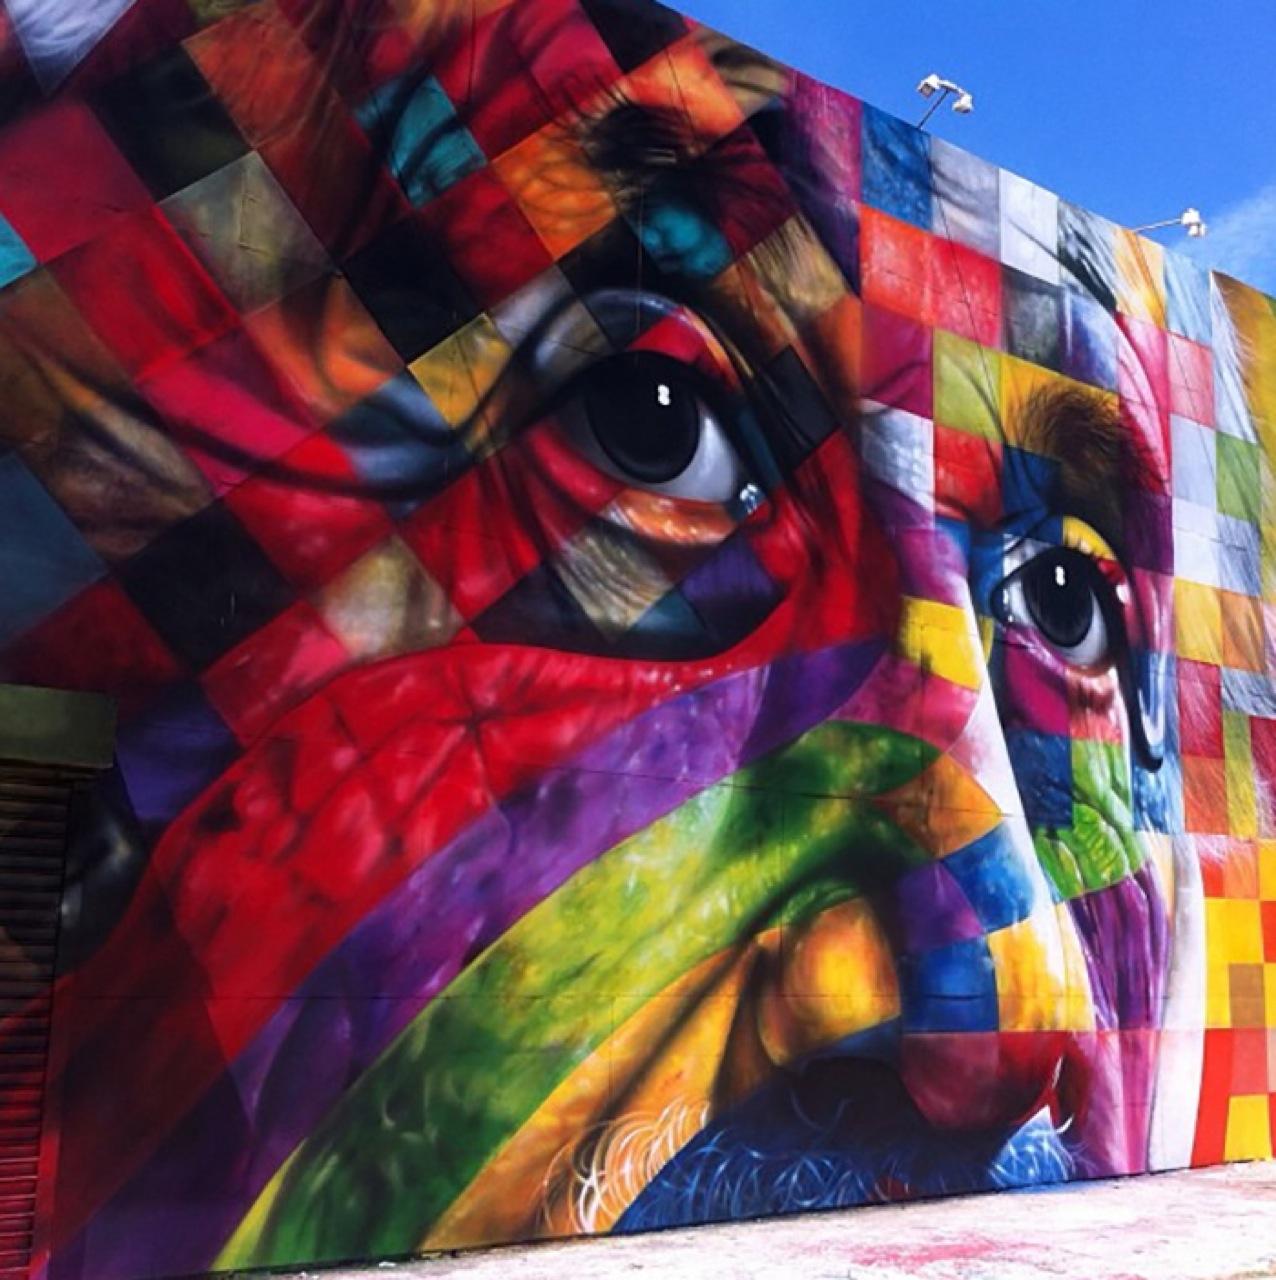 Eduardo Kobra New Mural In Los Angeles, USA